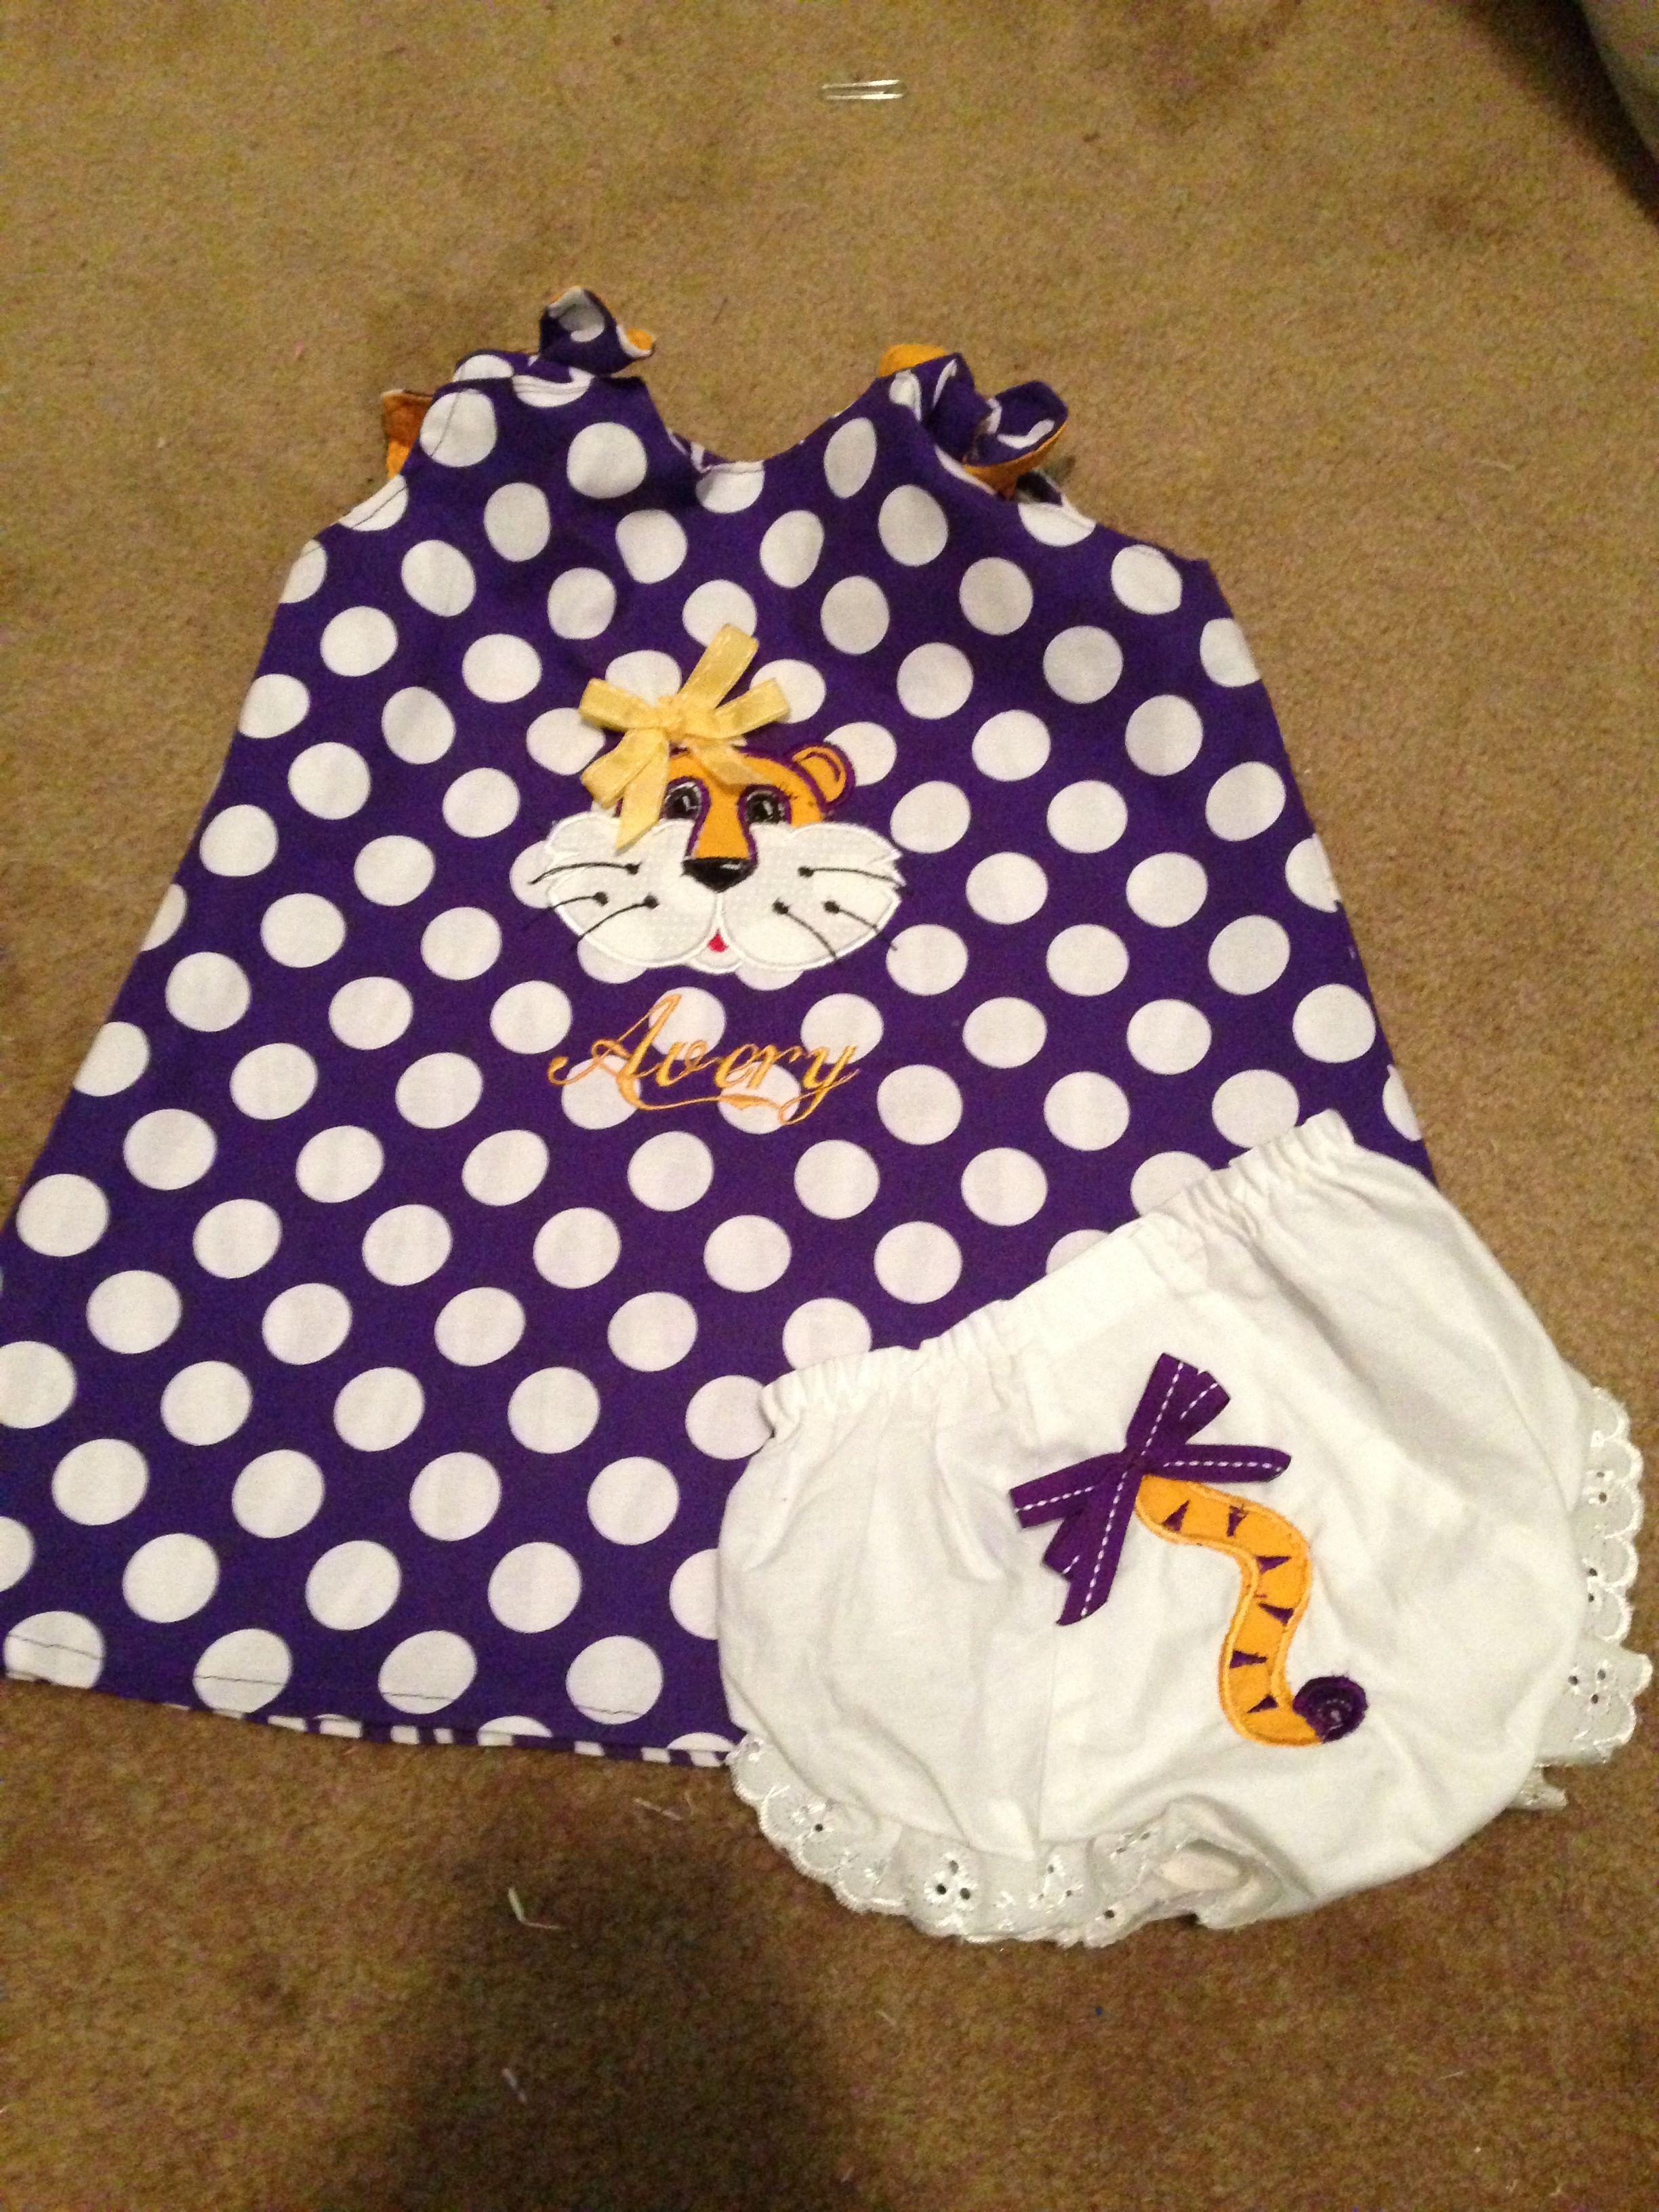 f37ec4a973cb2 LSU reversible dress | Grandbabies to Spoil Ideas | Baby boutique ...